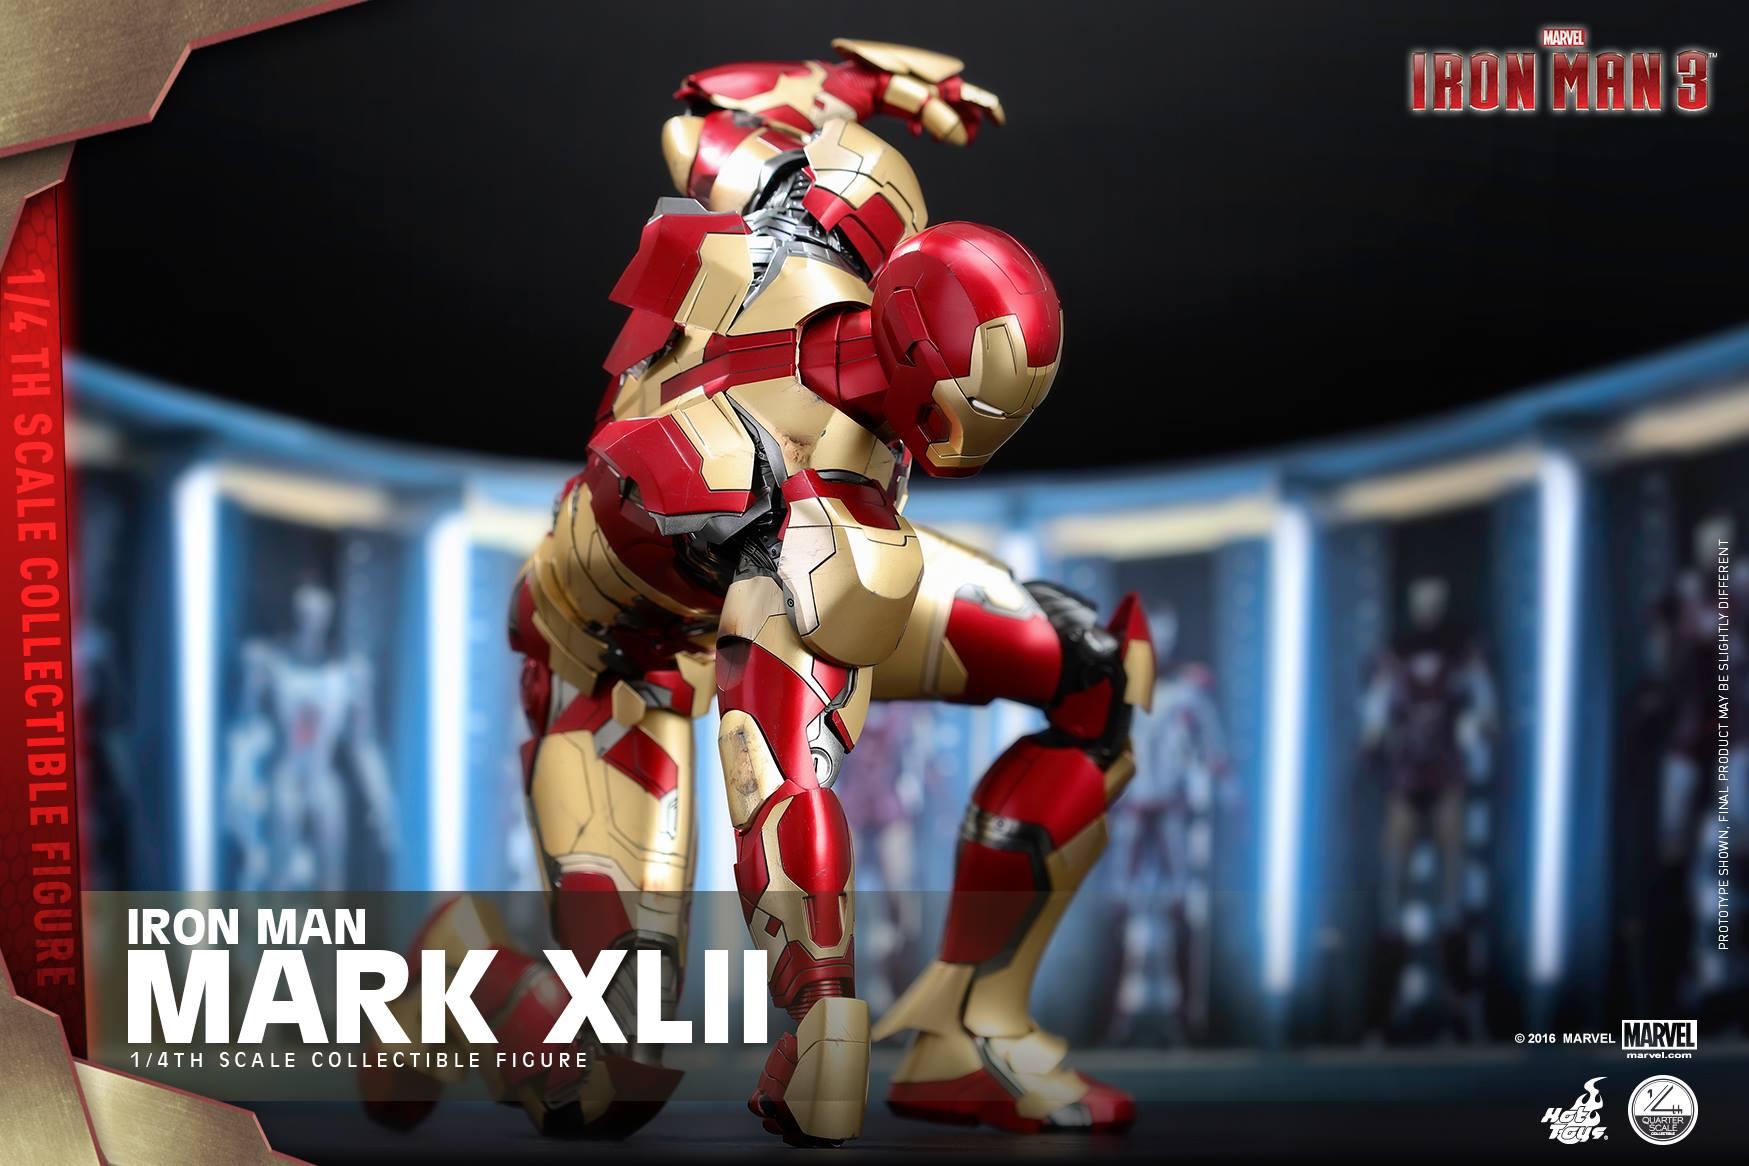 Hot Toys Iron Man Mark XLII Armor 1/4″ Scale Figure